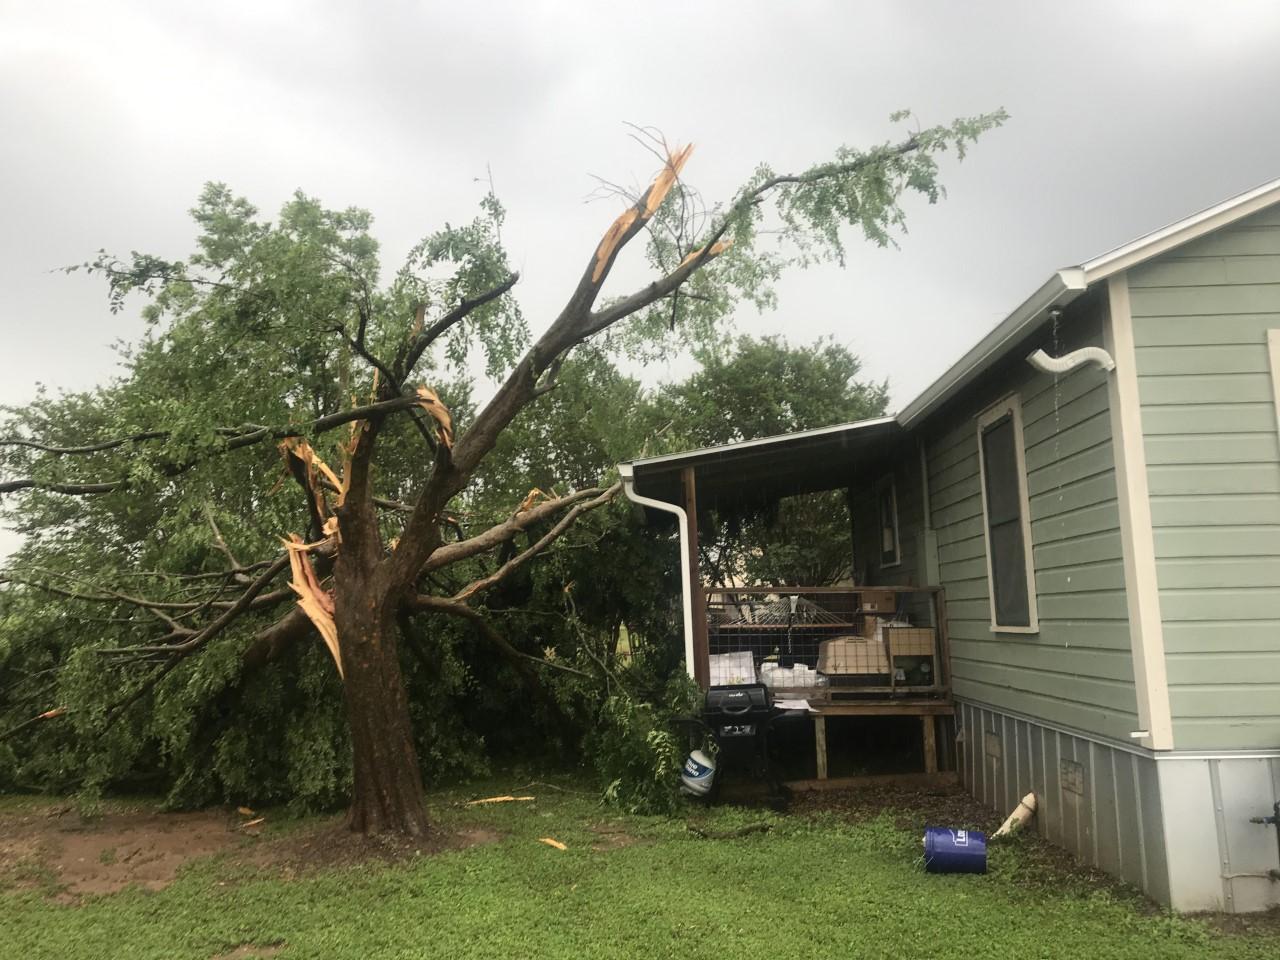 Tornado damage at a house in Smithville on Logan lane. (Courtesy Scott Saunders, Smithville Mayor)